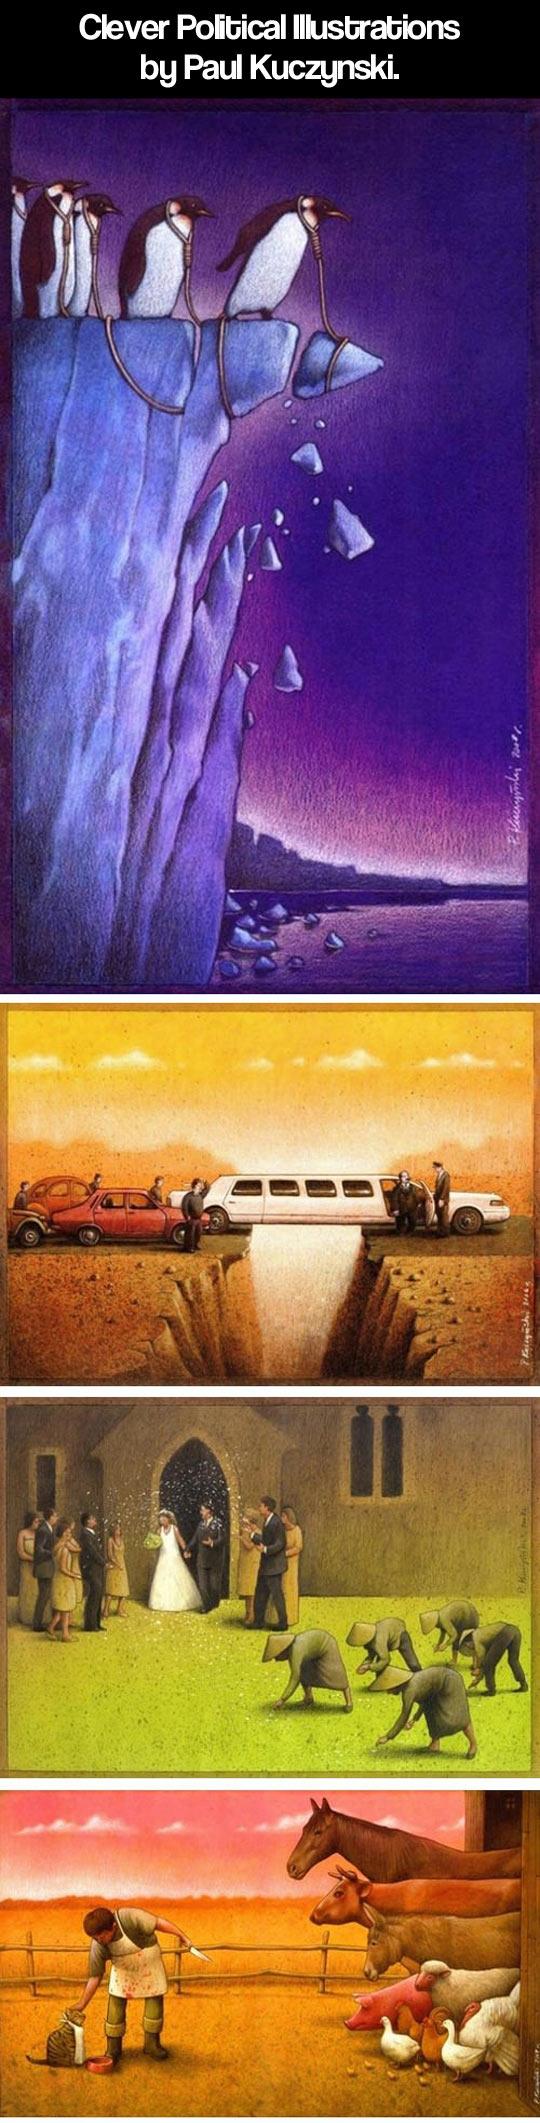 funny-Paul-Kuczynski-illustration-politics-society